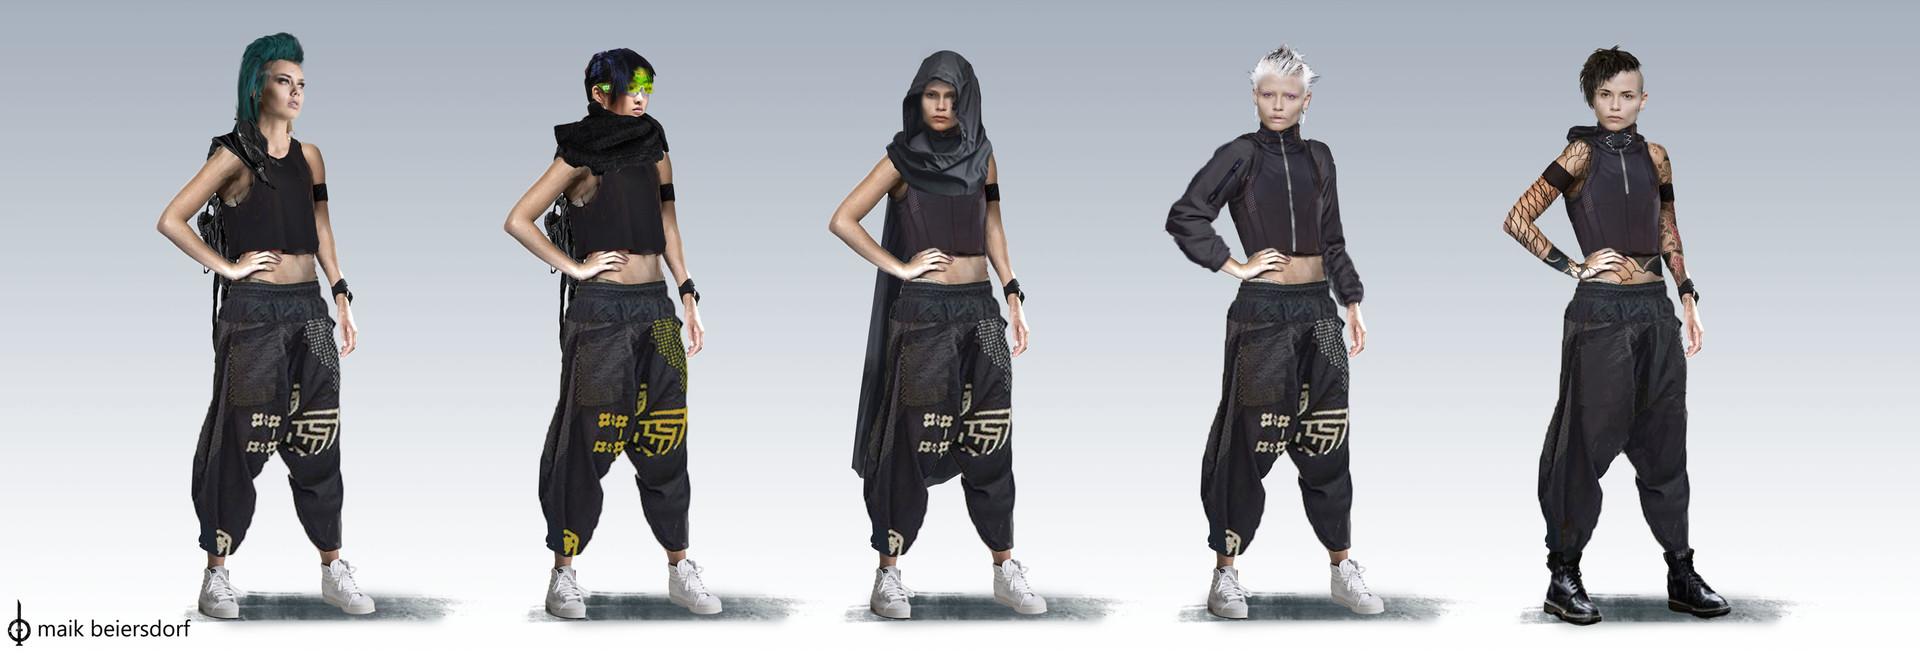 Maik beiersdorf character designs heroine